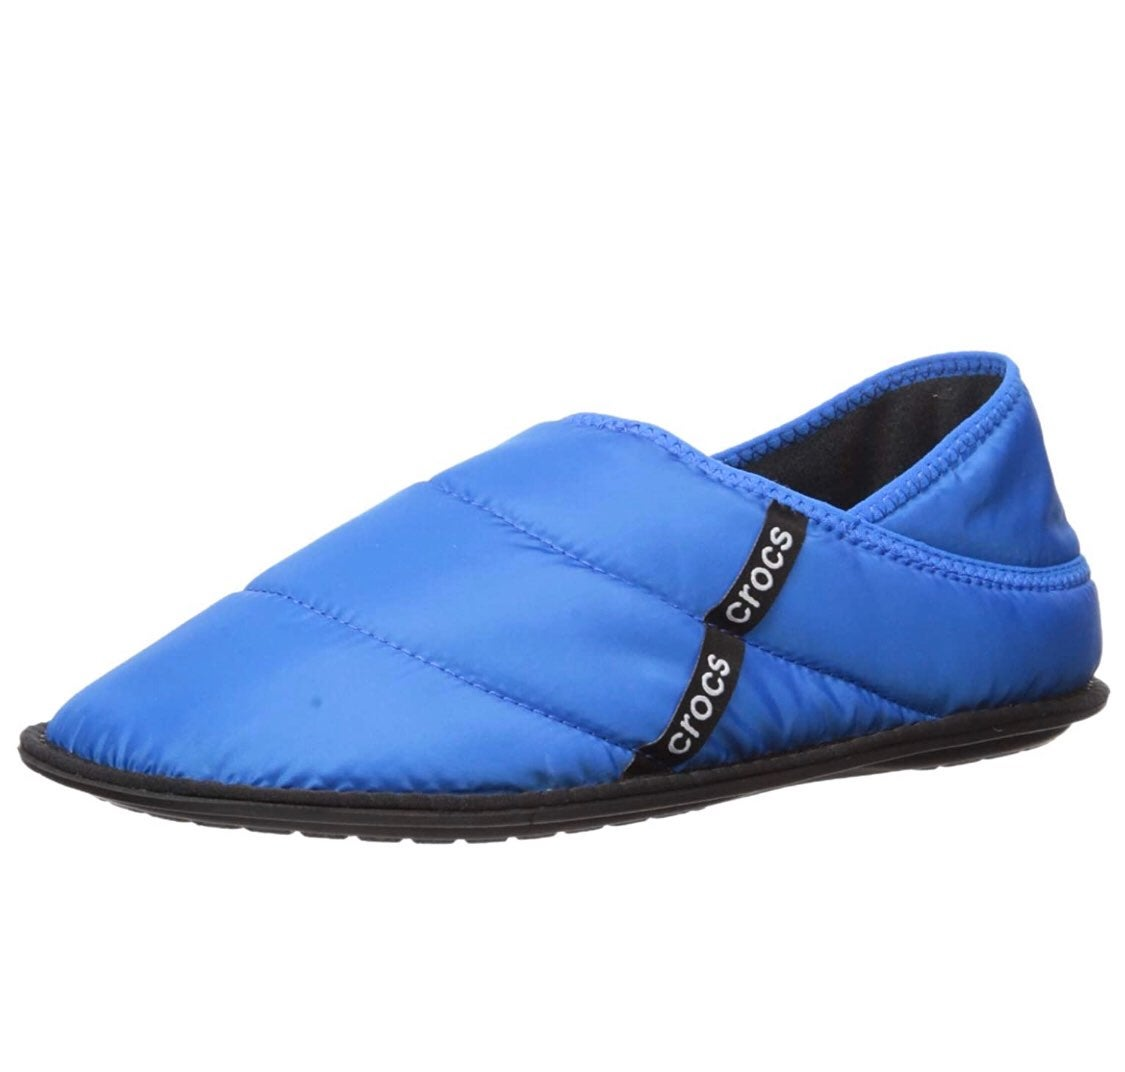 *NEW*Crocs Convertible fold-down heels